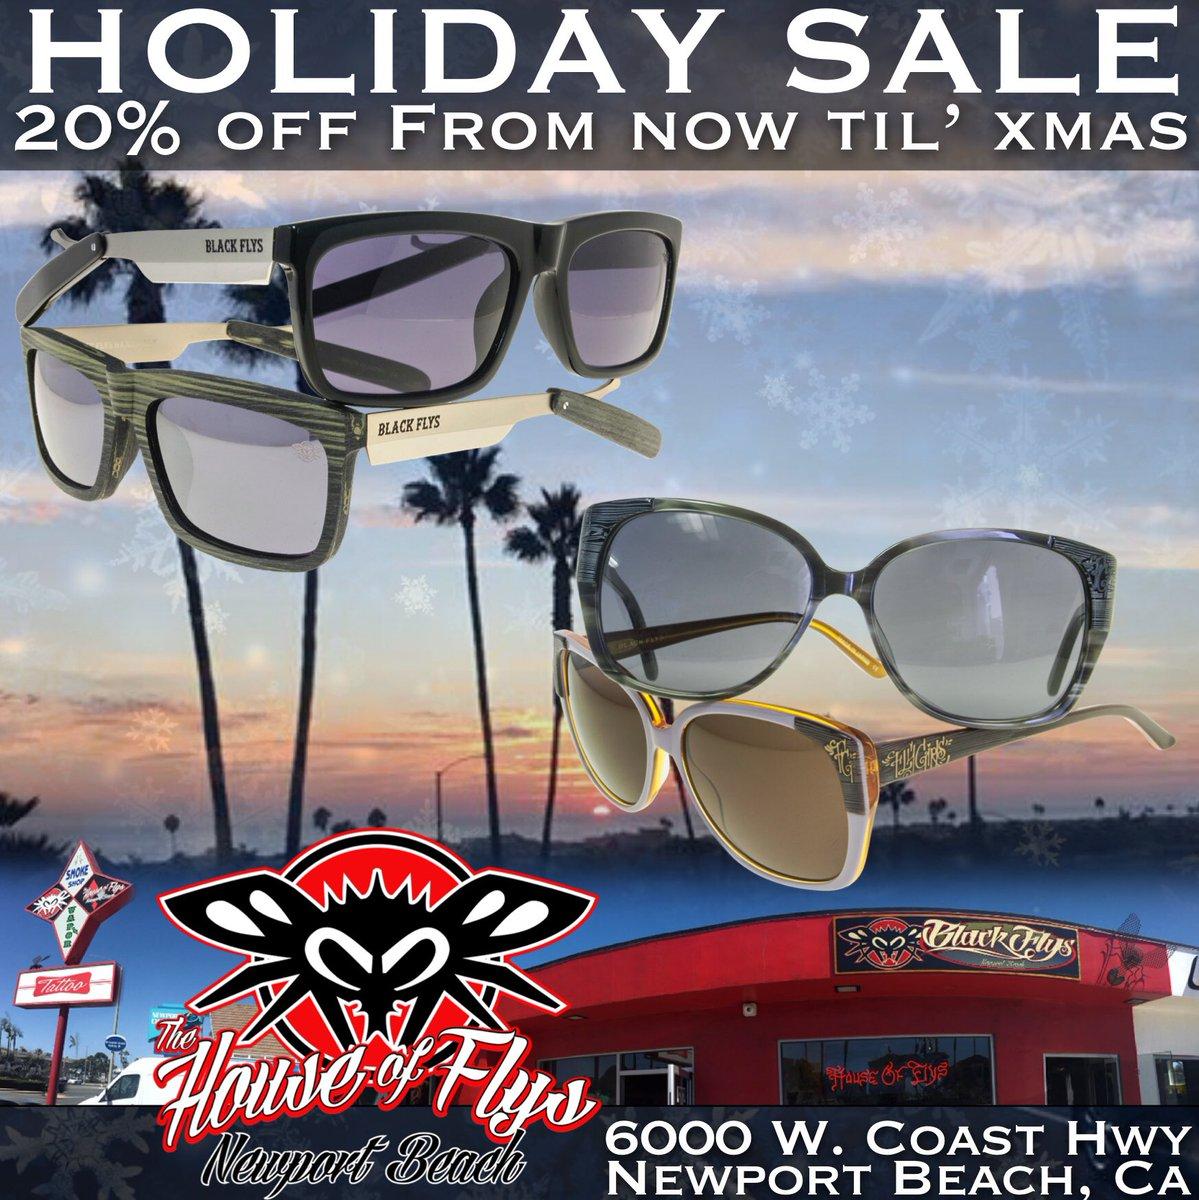 a03ca26c961 Stop by House of Flys on 6000 W Coast Hwy in beautiful Newport Beach